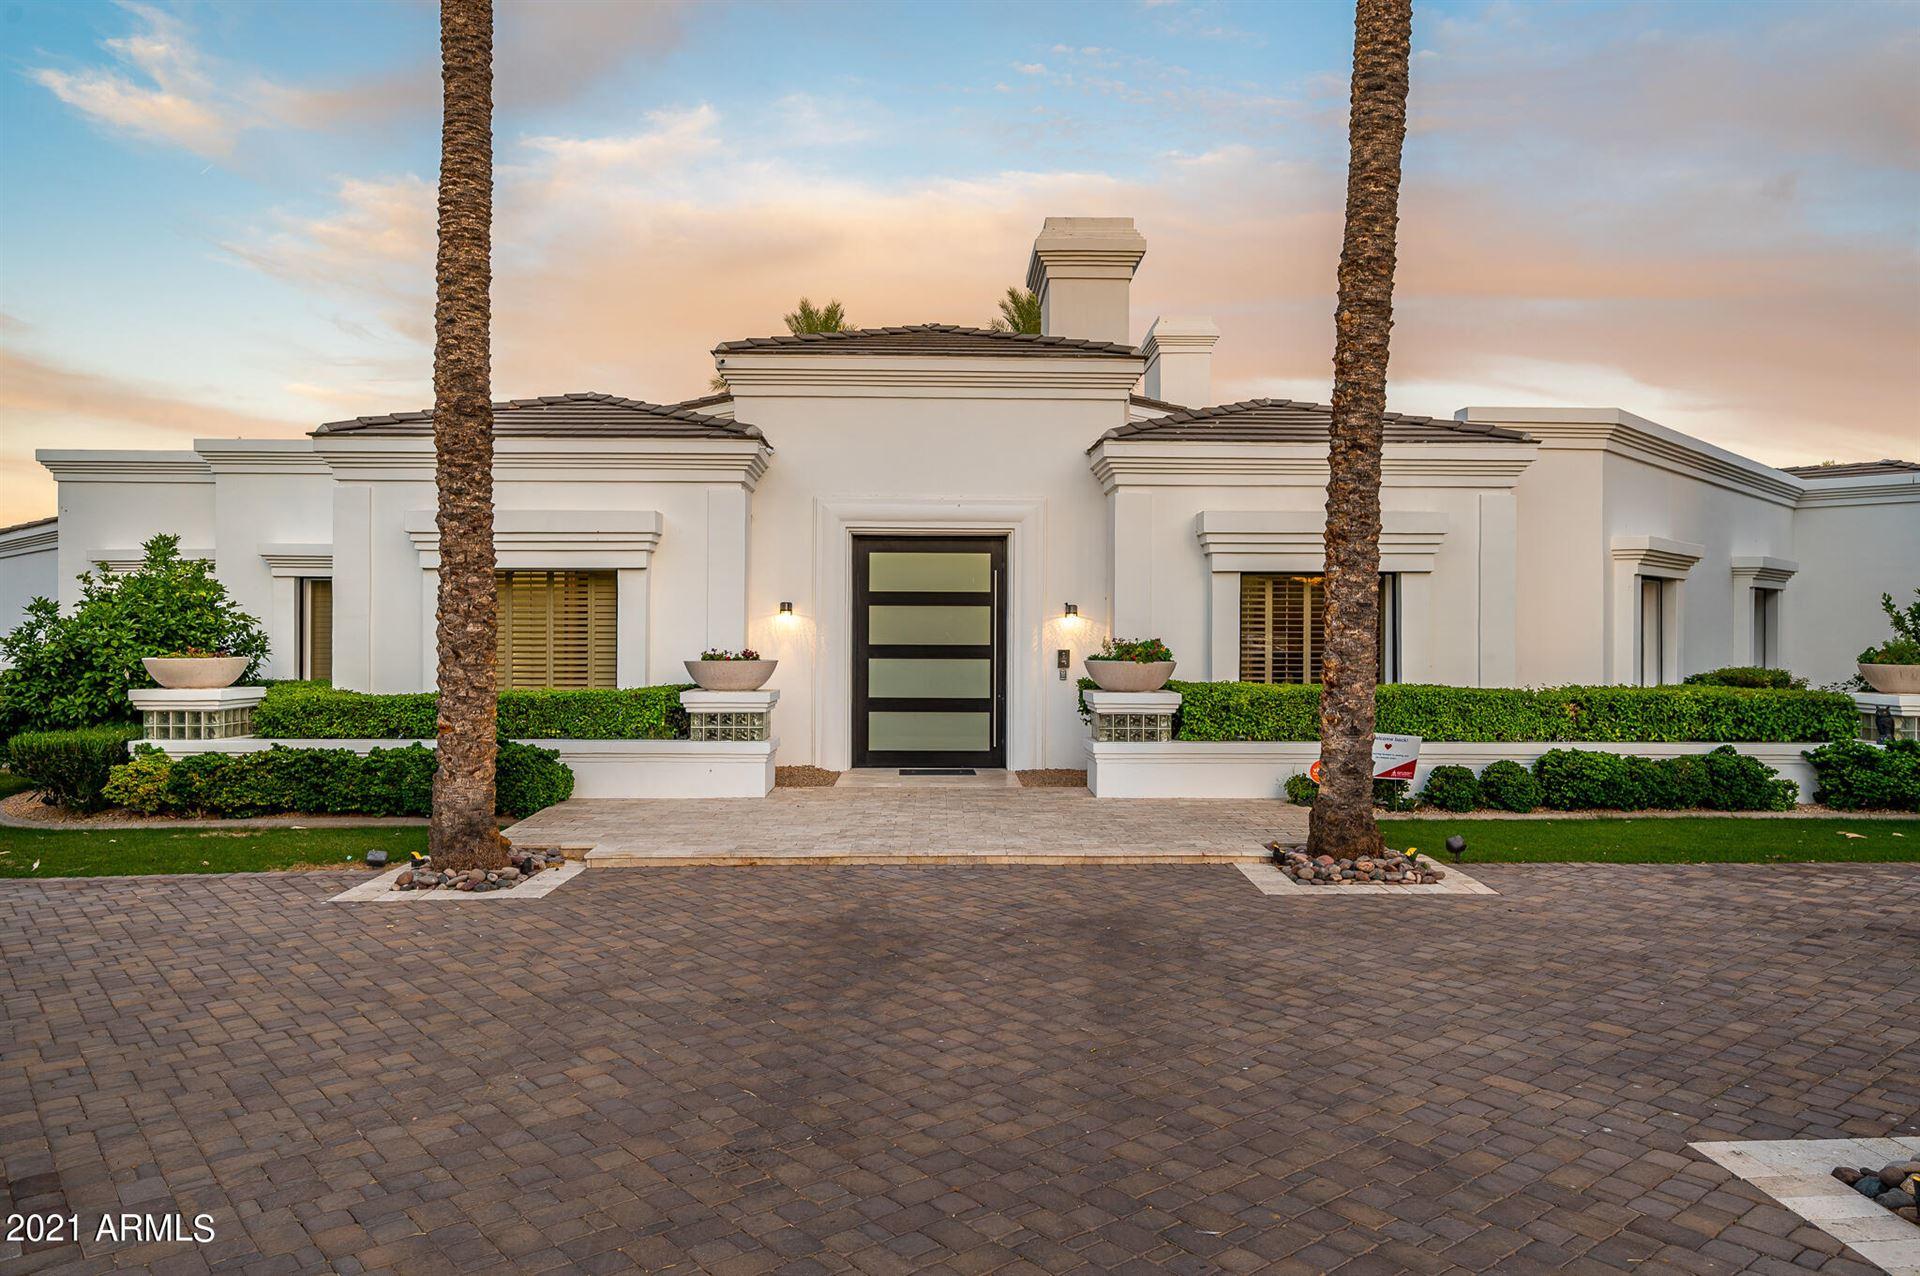 Photo of 6661 E SAN MIGUEL Avenue, Paradise Valley, AZ 85253 (MLS # 6249166)